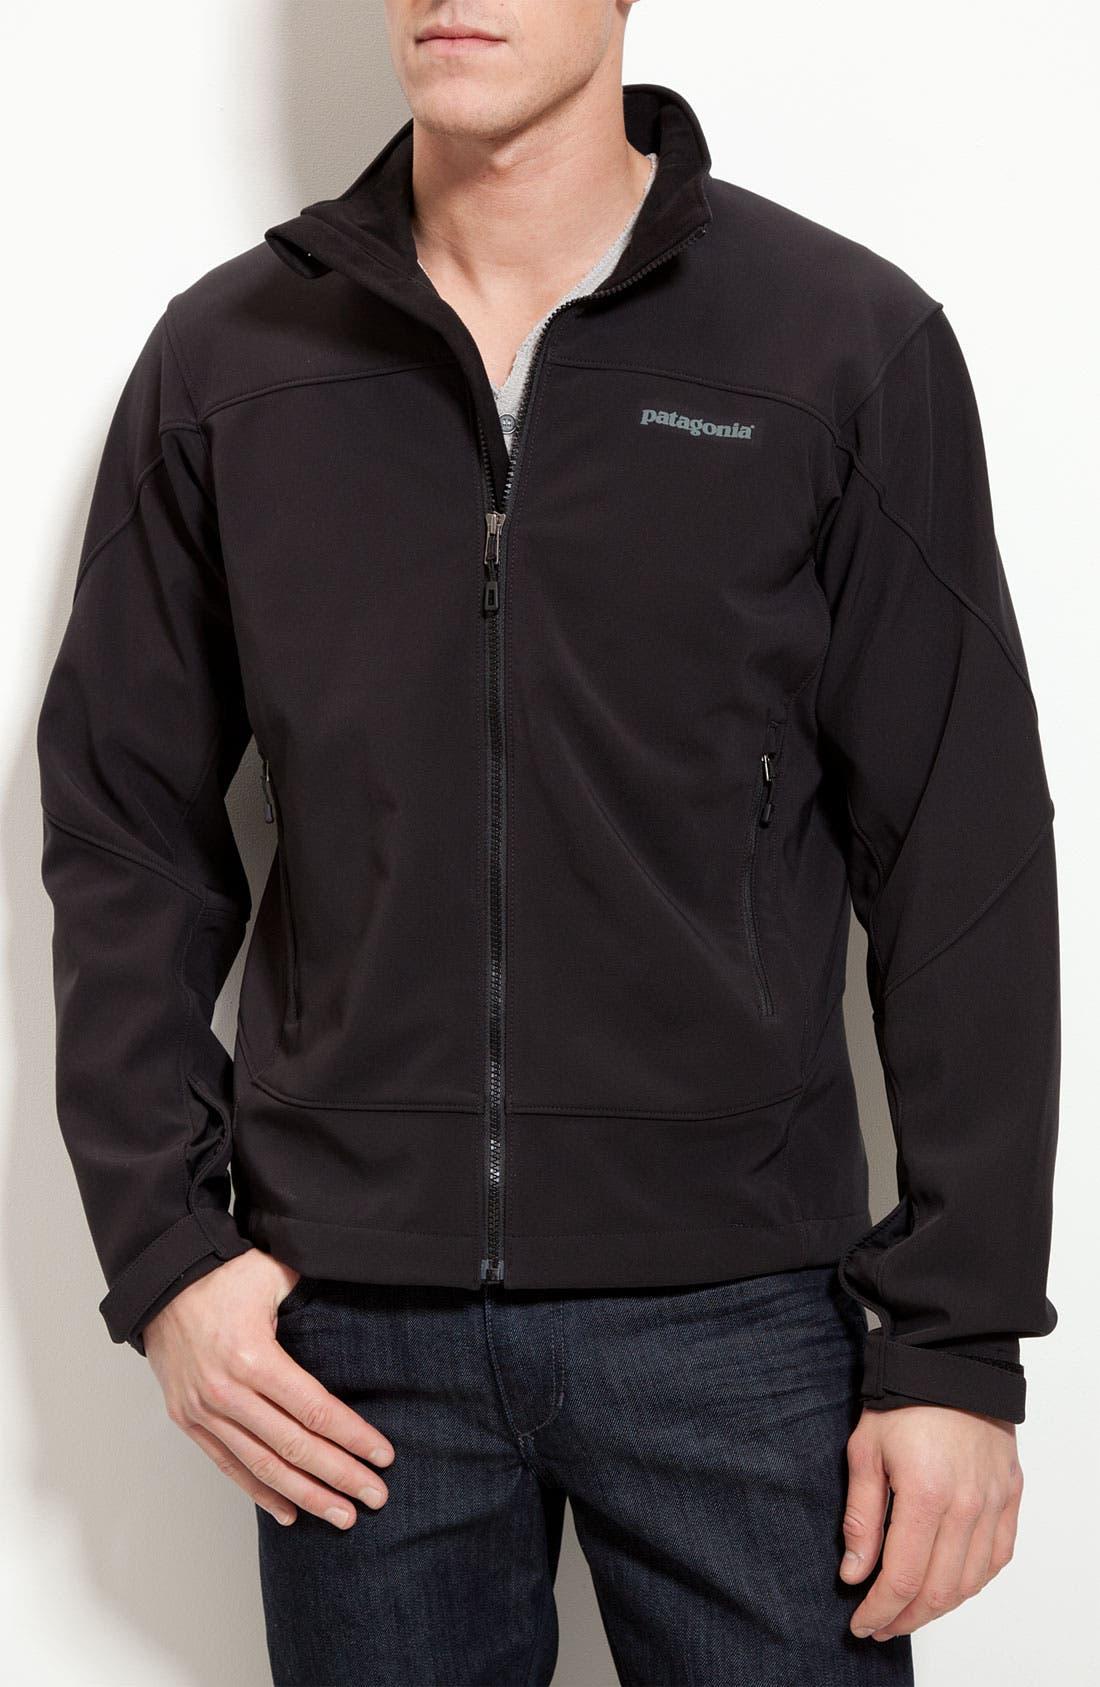 Main Image - Patagonia 'Adze' Soft Shell Zip Jacket